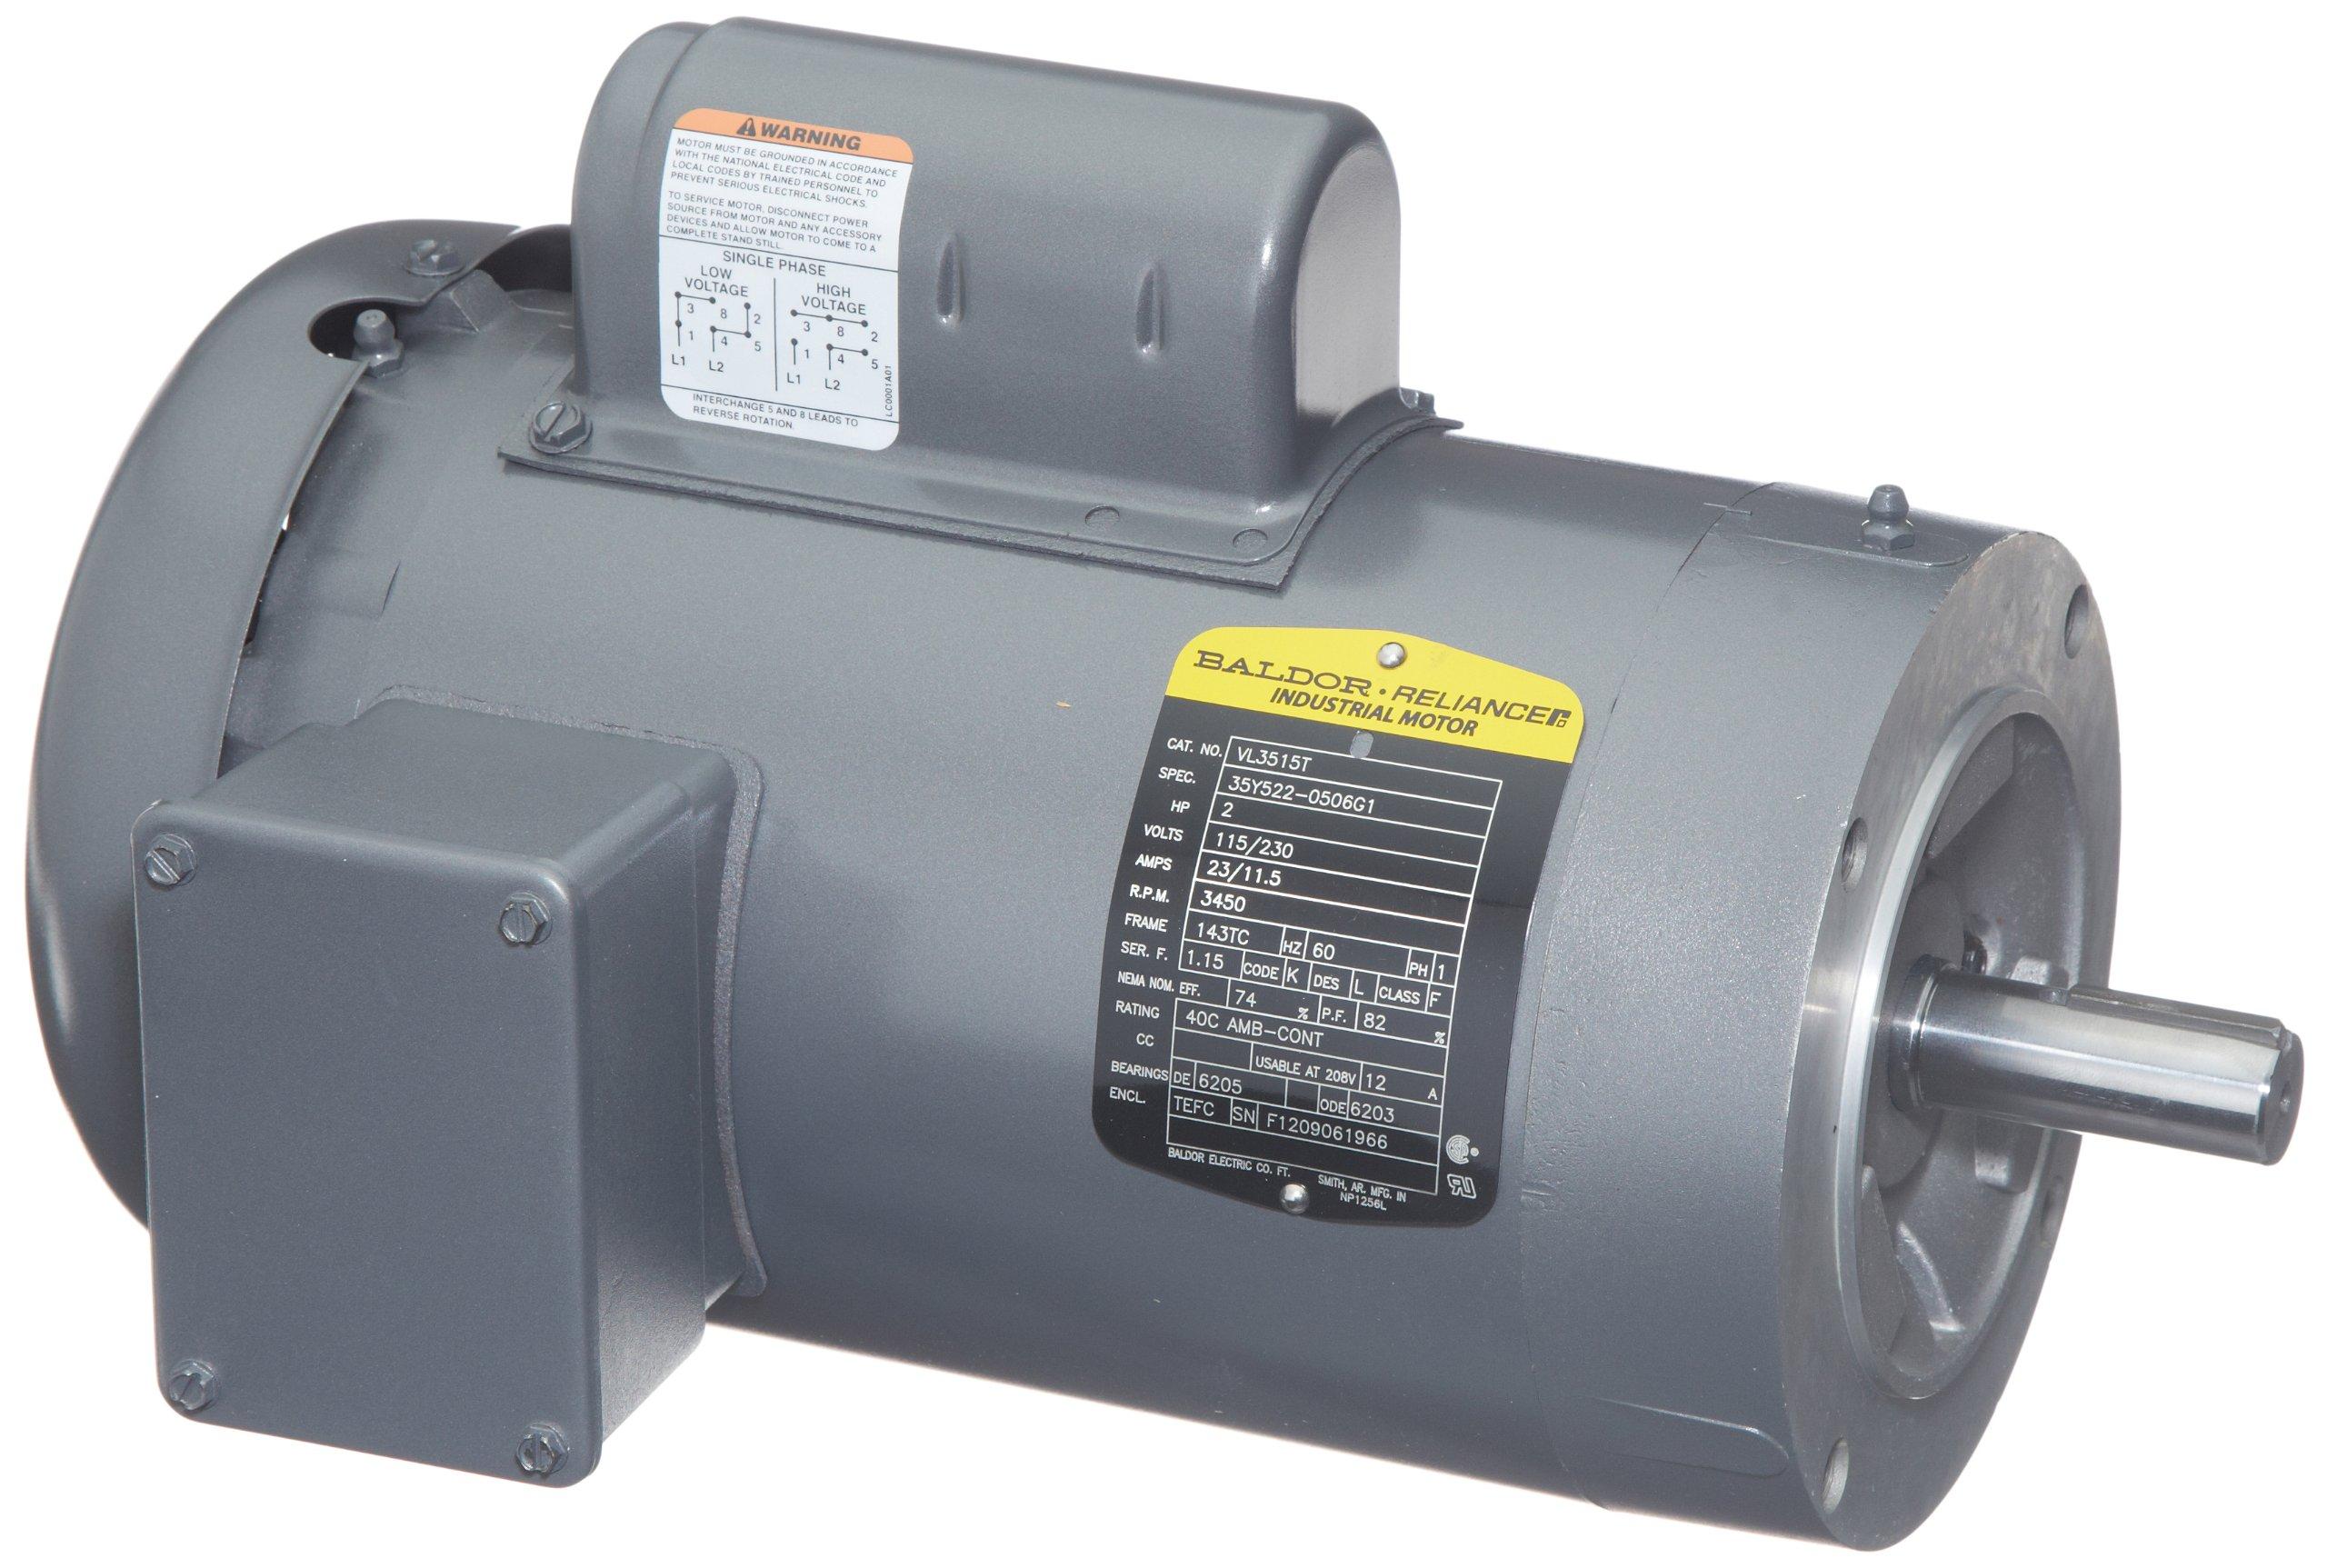 Baldor VL3515T General Purpose AC Motor, Single Phase, 143TC Frame, TEFC Enclosure, 2Hp Output, 3450rpm, 60Hz, 115/230V Voltage